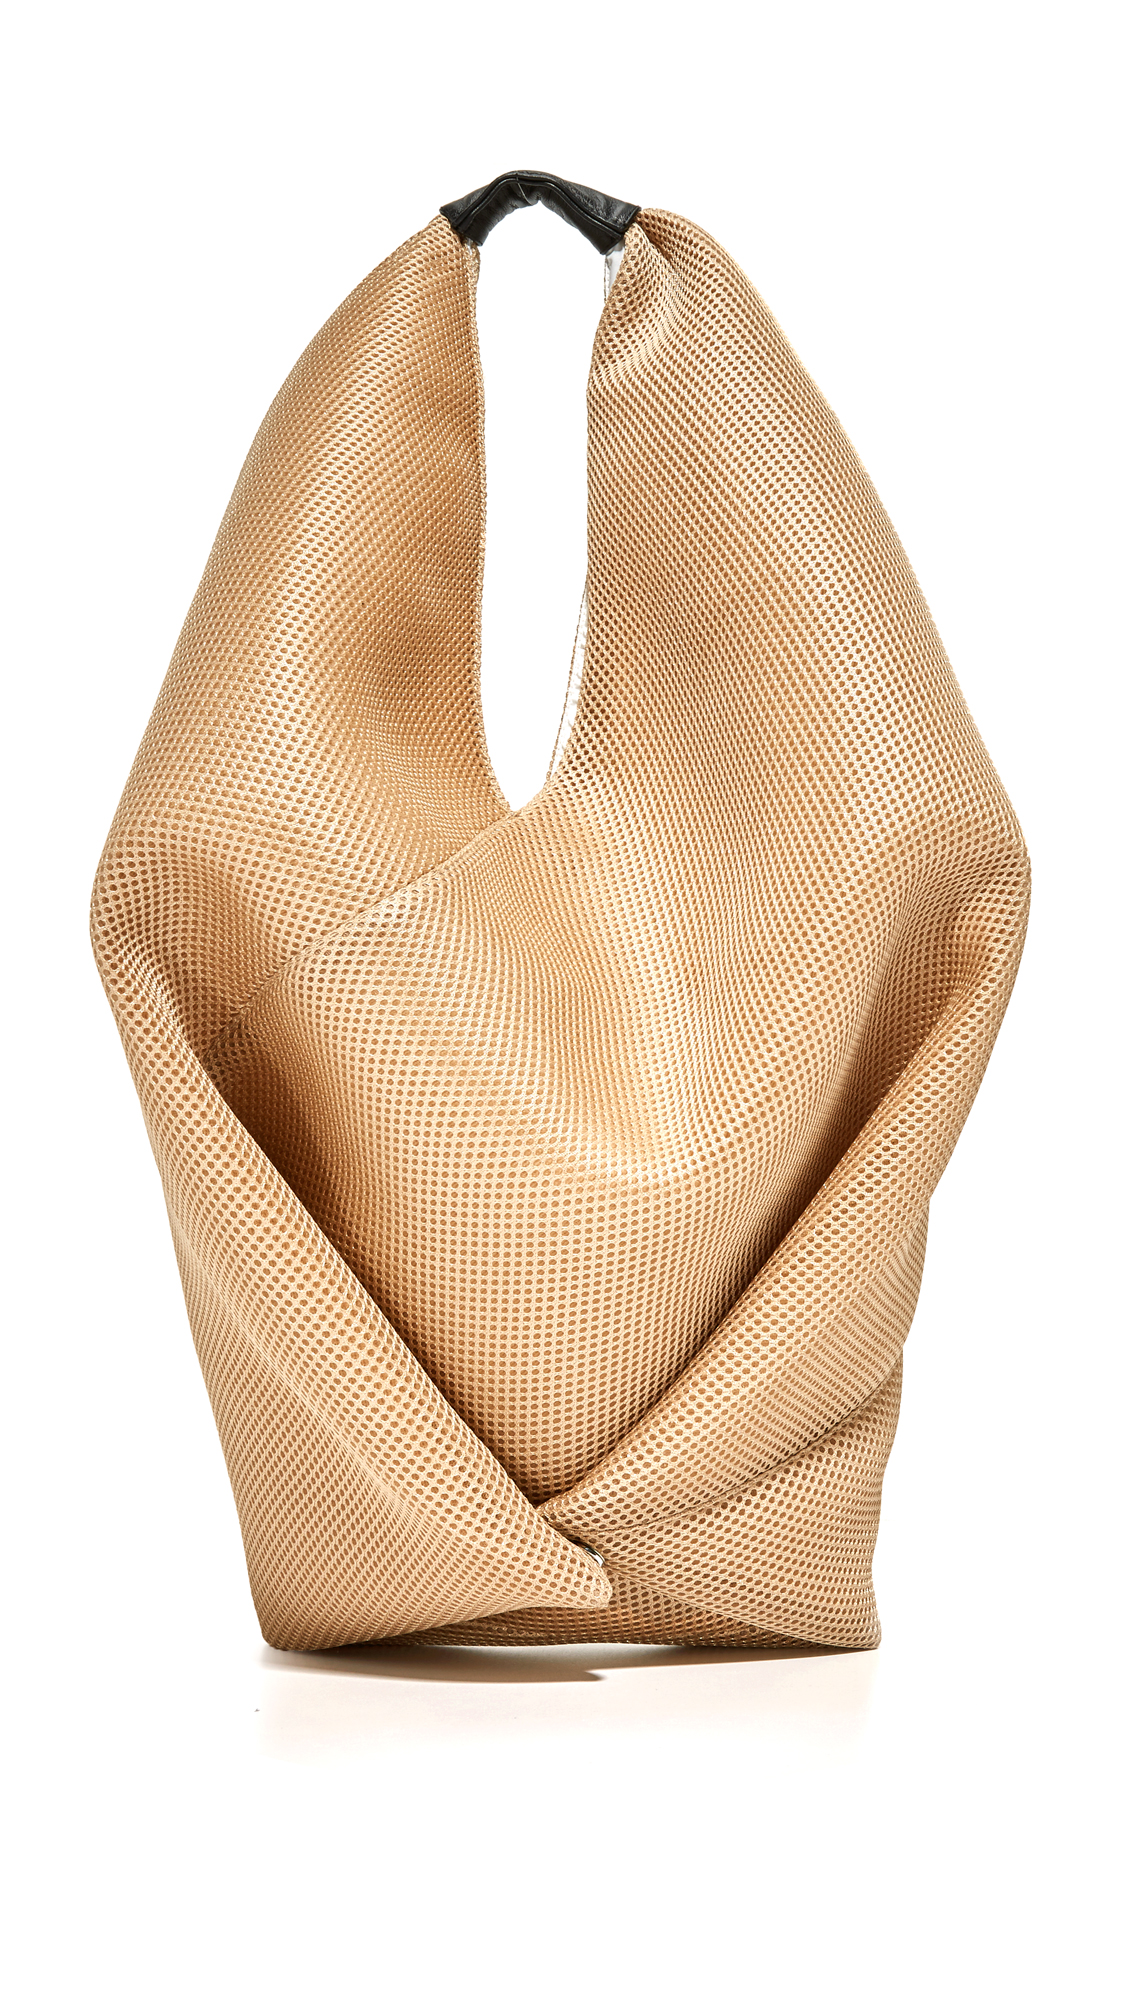 mm6 female mm6 hobo bag beige